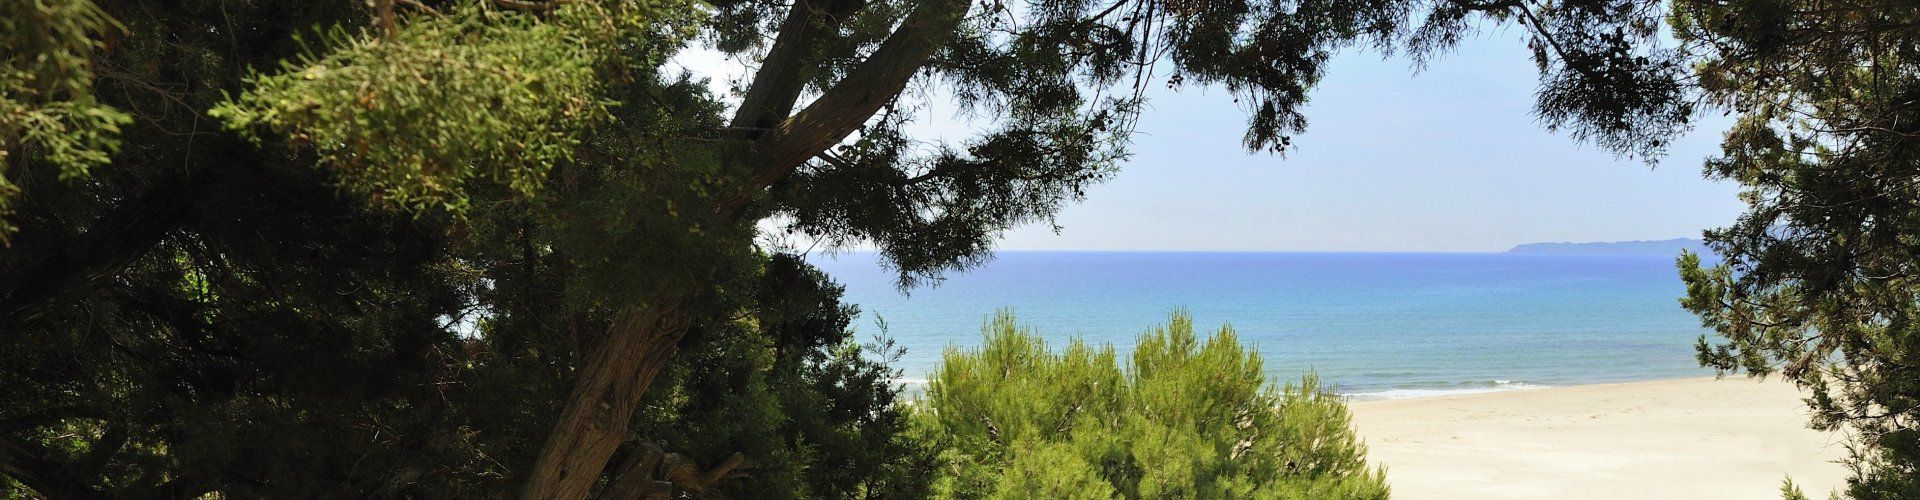 Vista dalla terrazza di Bau Cannas